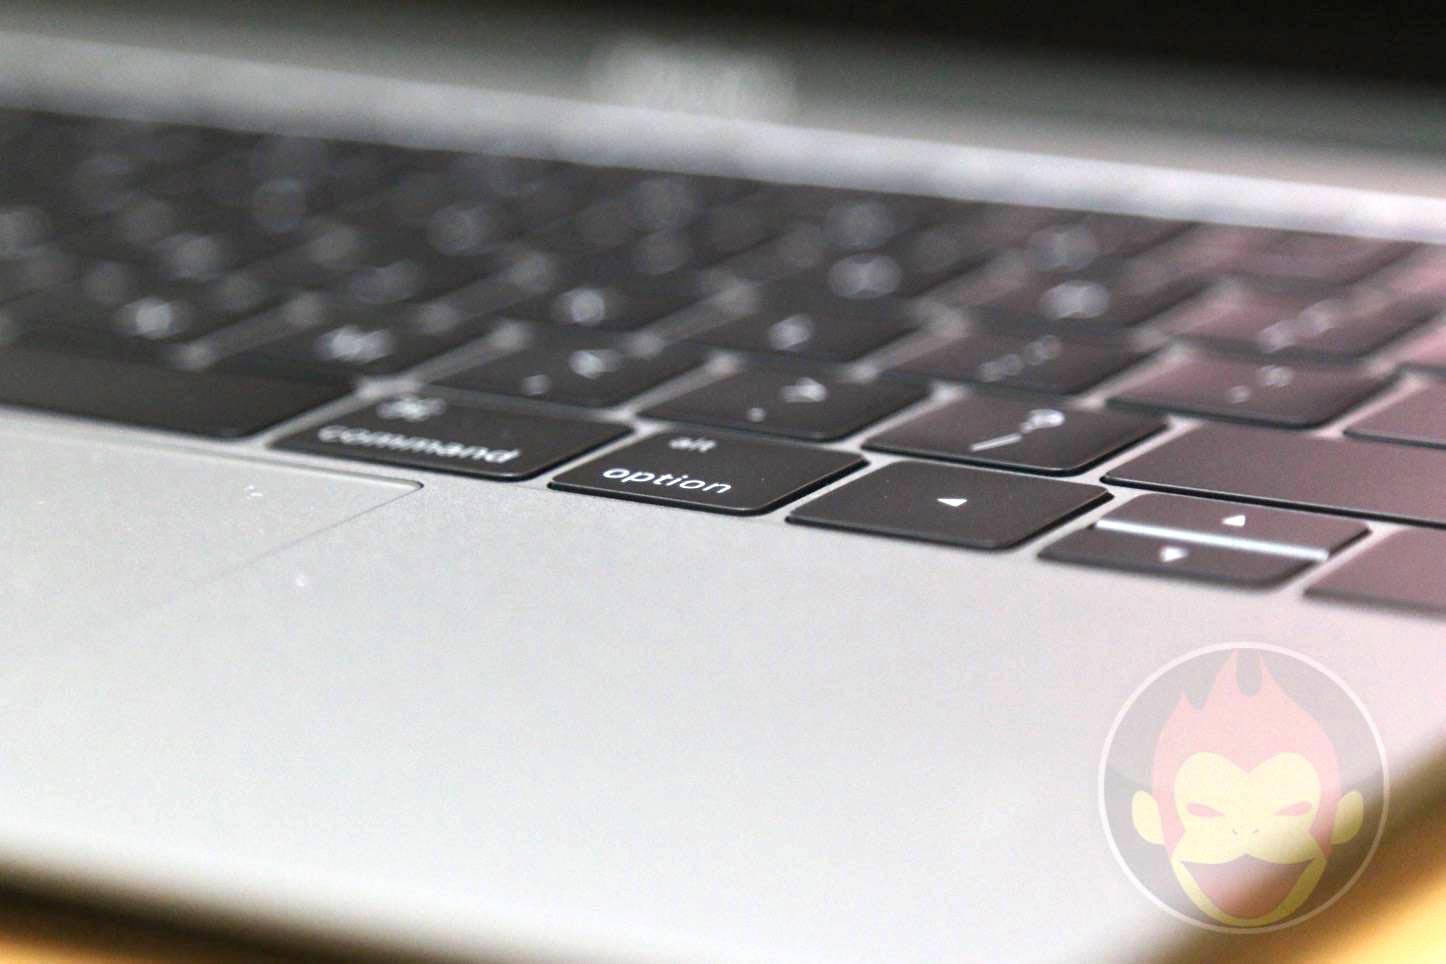 12inch-The-New-MacBook-78.JPG